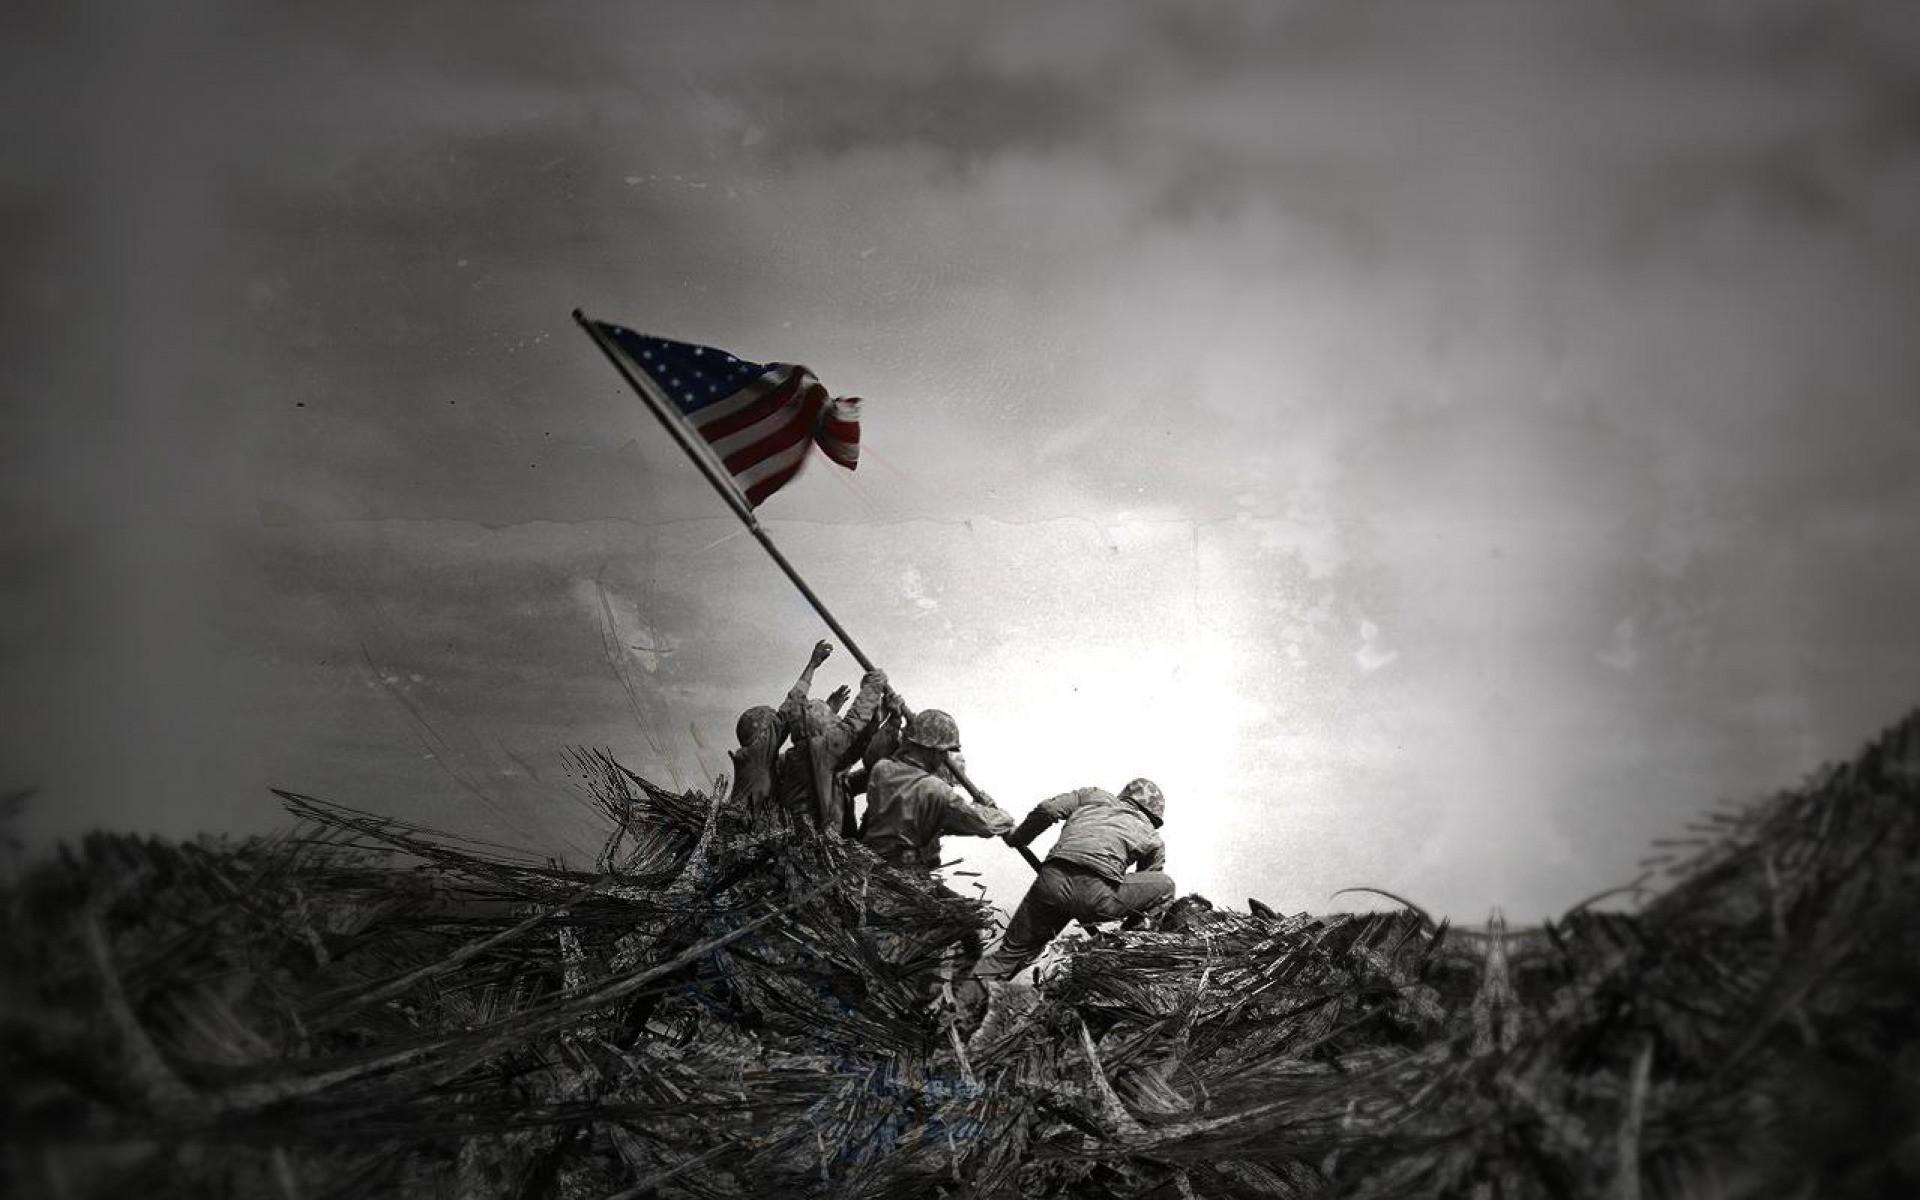 Patriotic Military Desktop Wallpaper Images & Pictures – Becuo